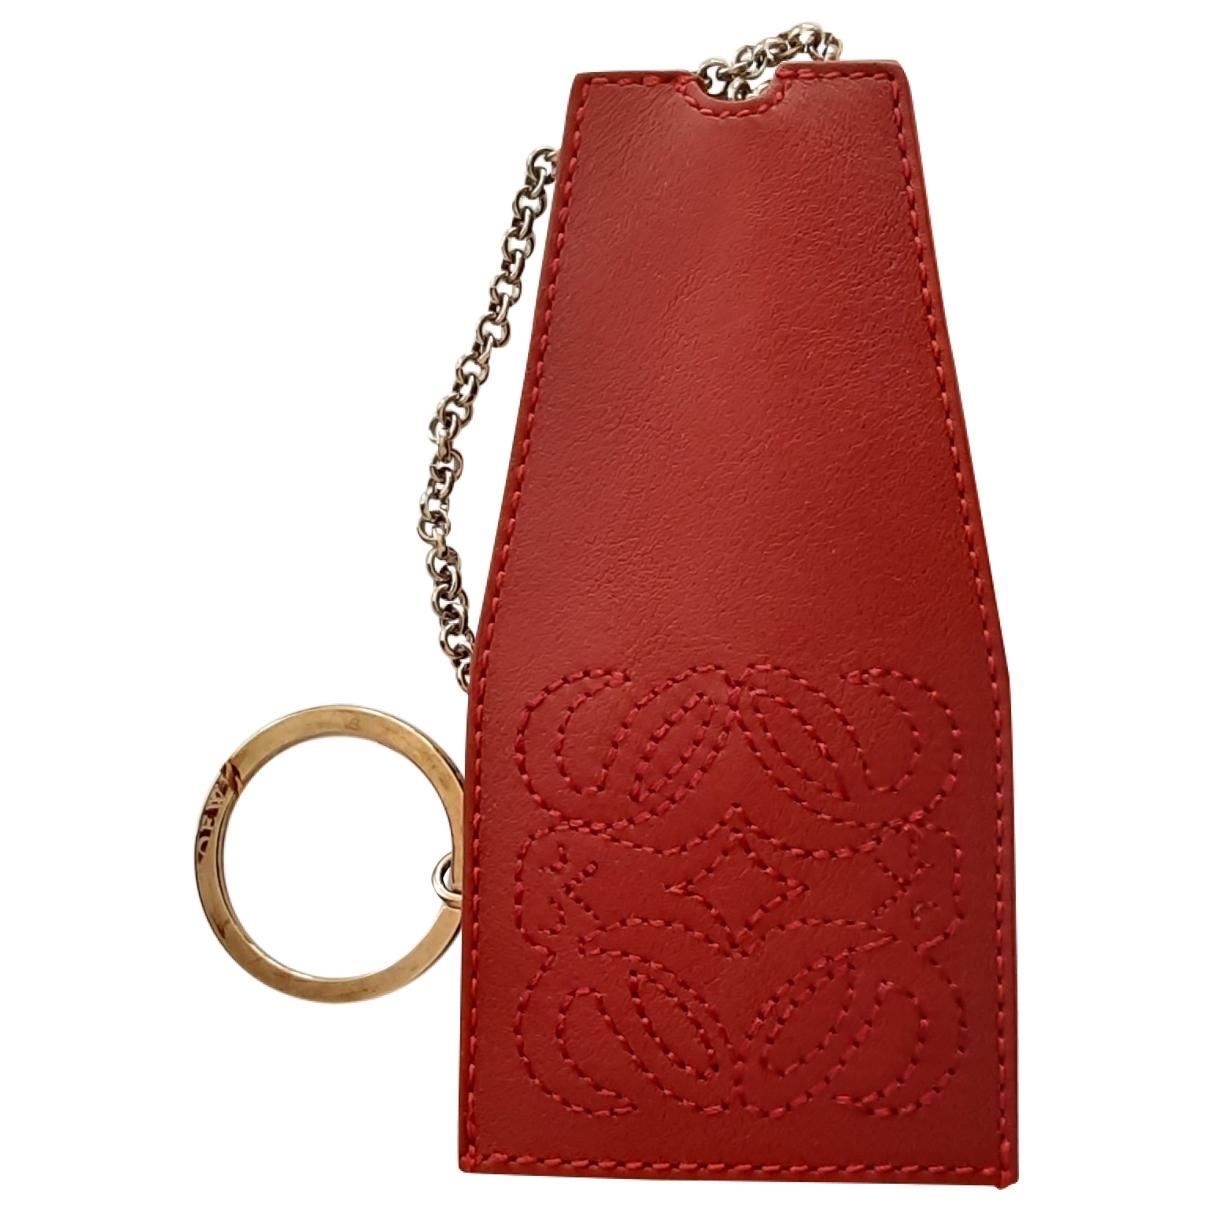 Loewe \N Red Leather Bag charms for Women \N